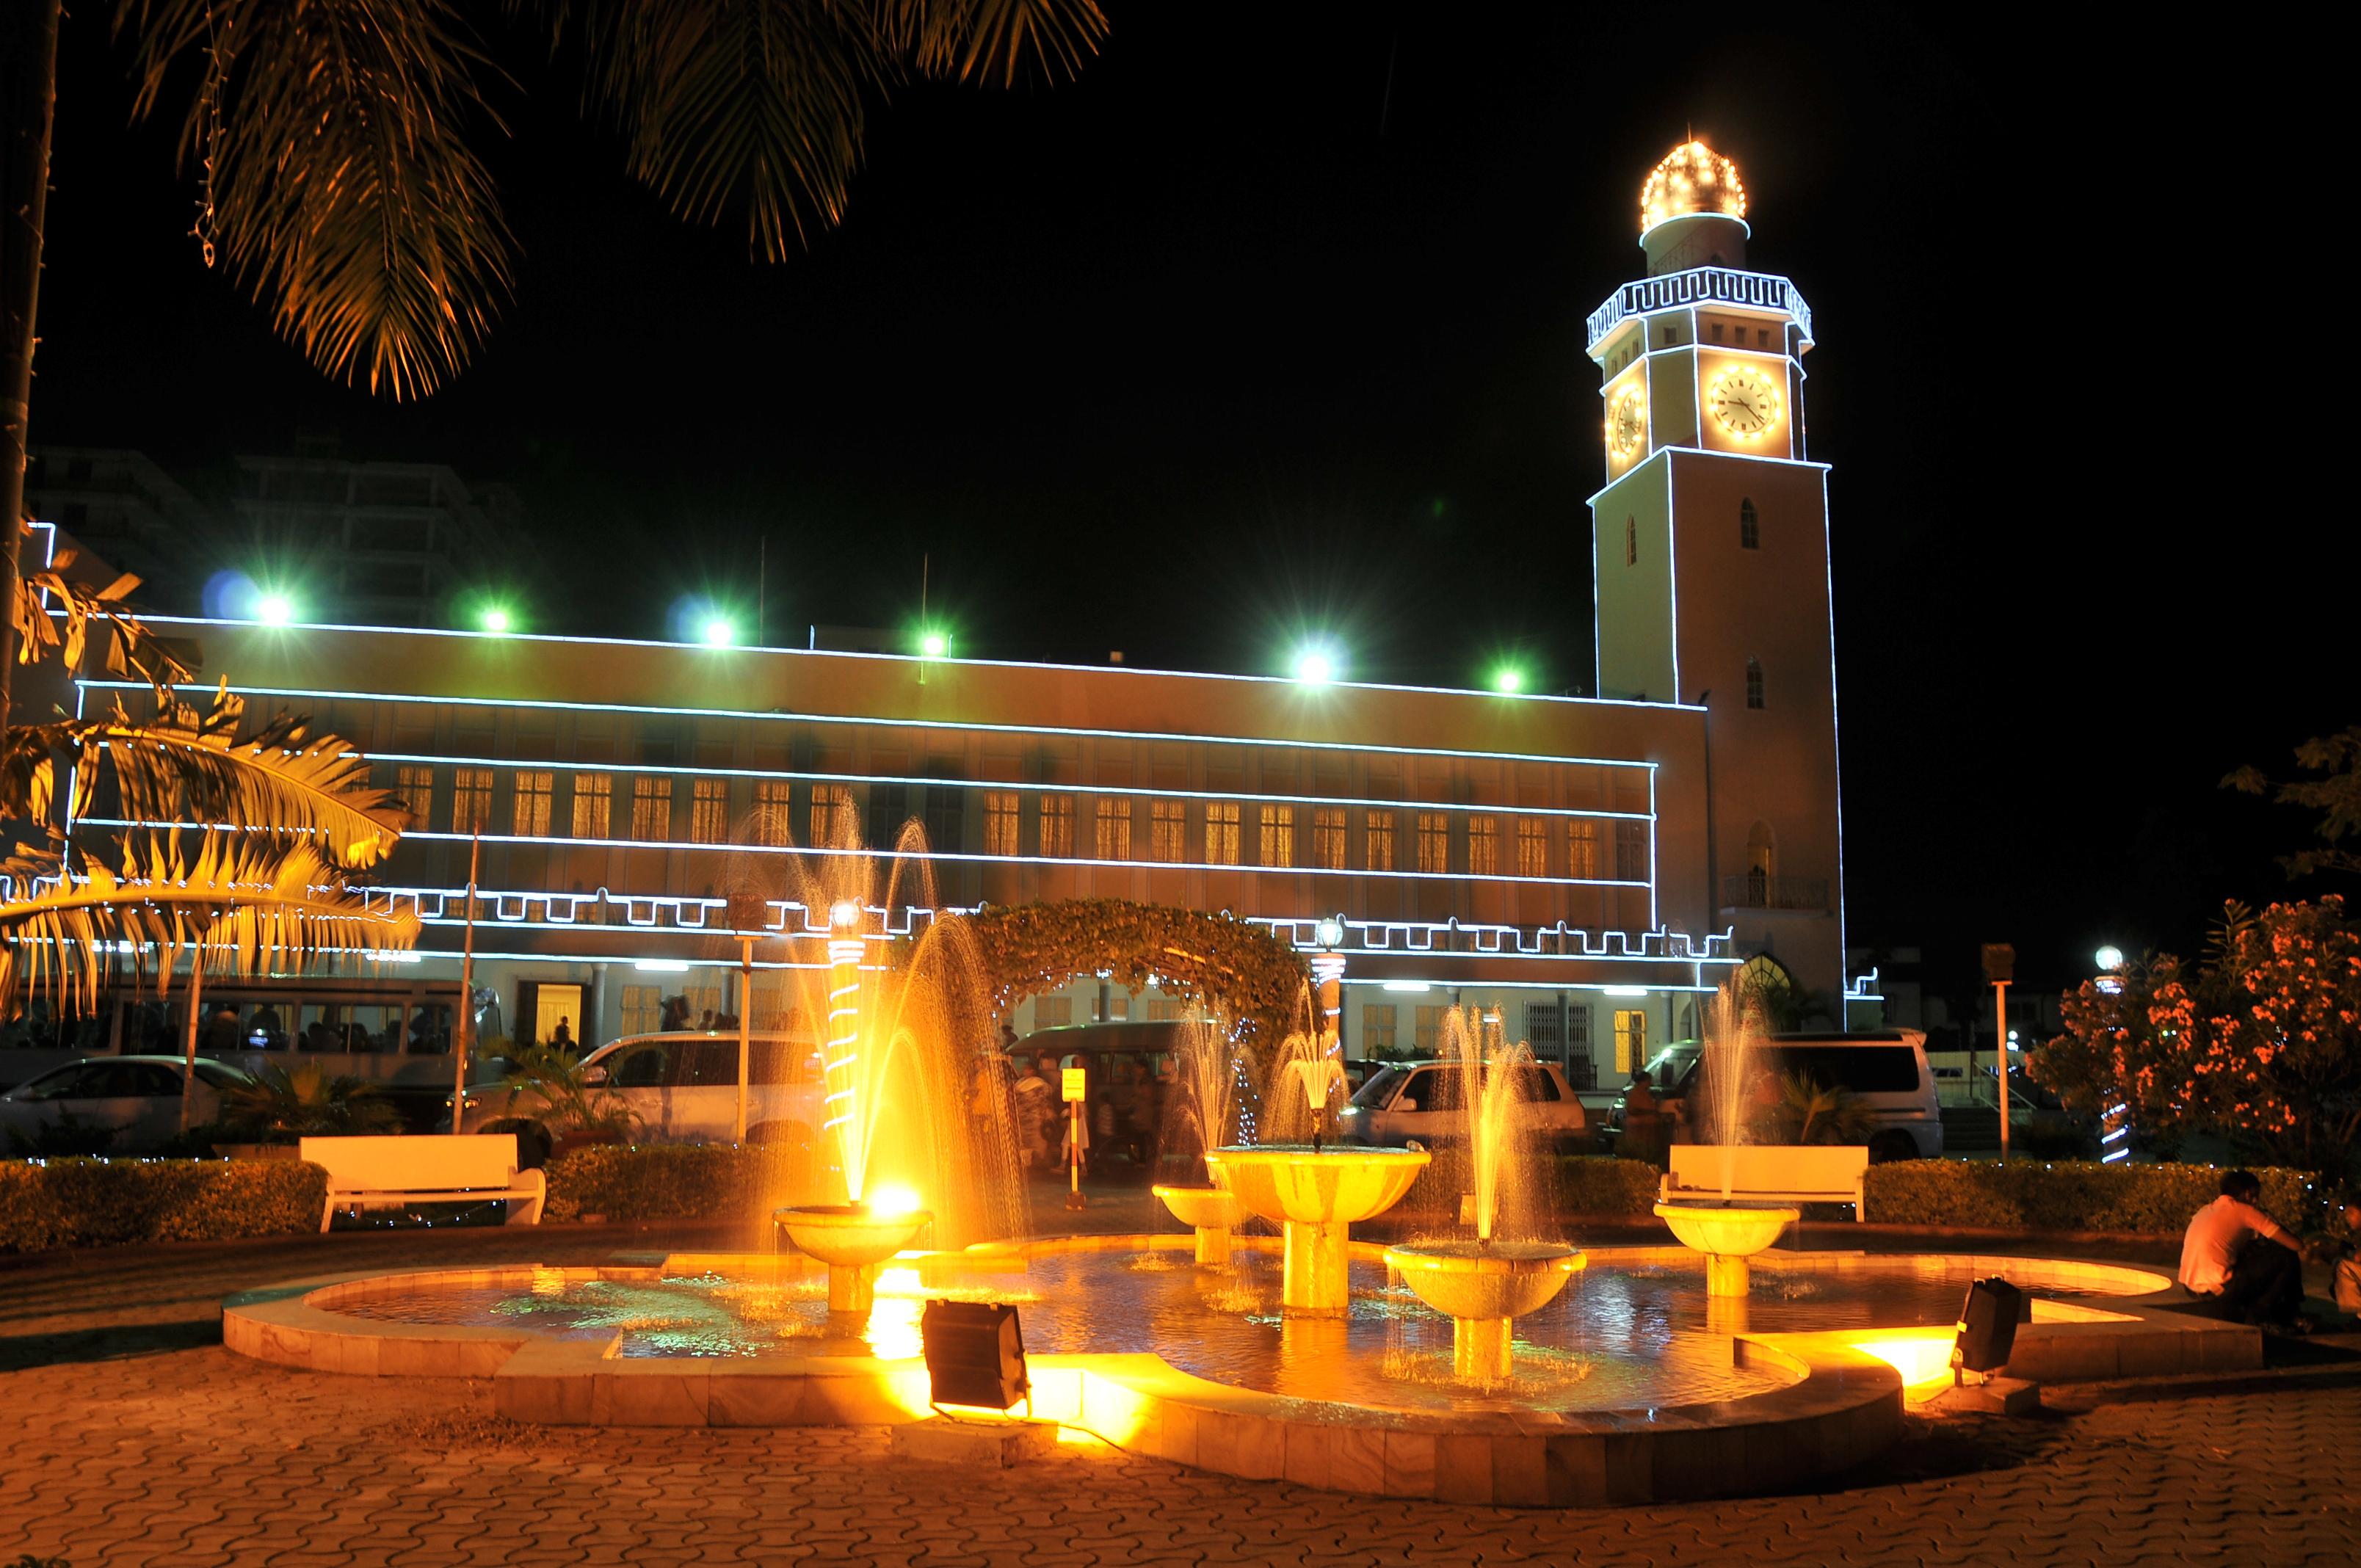 Personals in Dating Dar-Es-Salaam